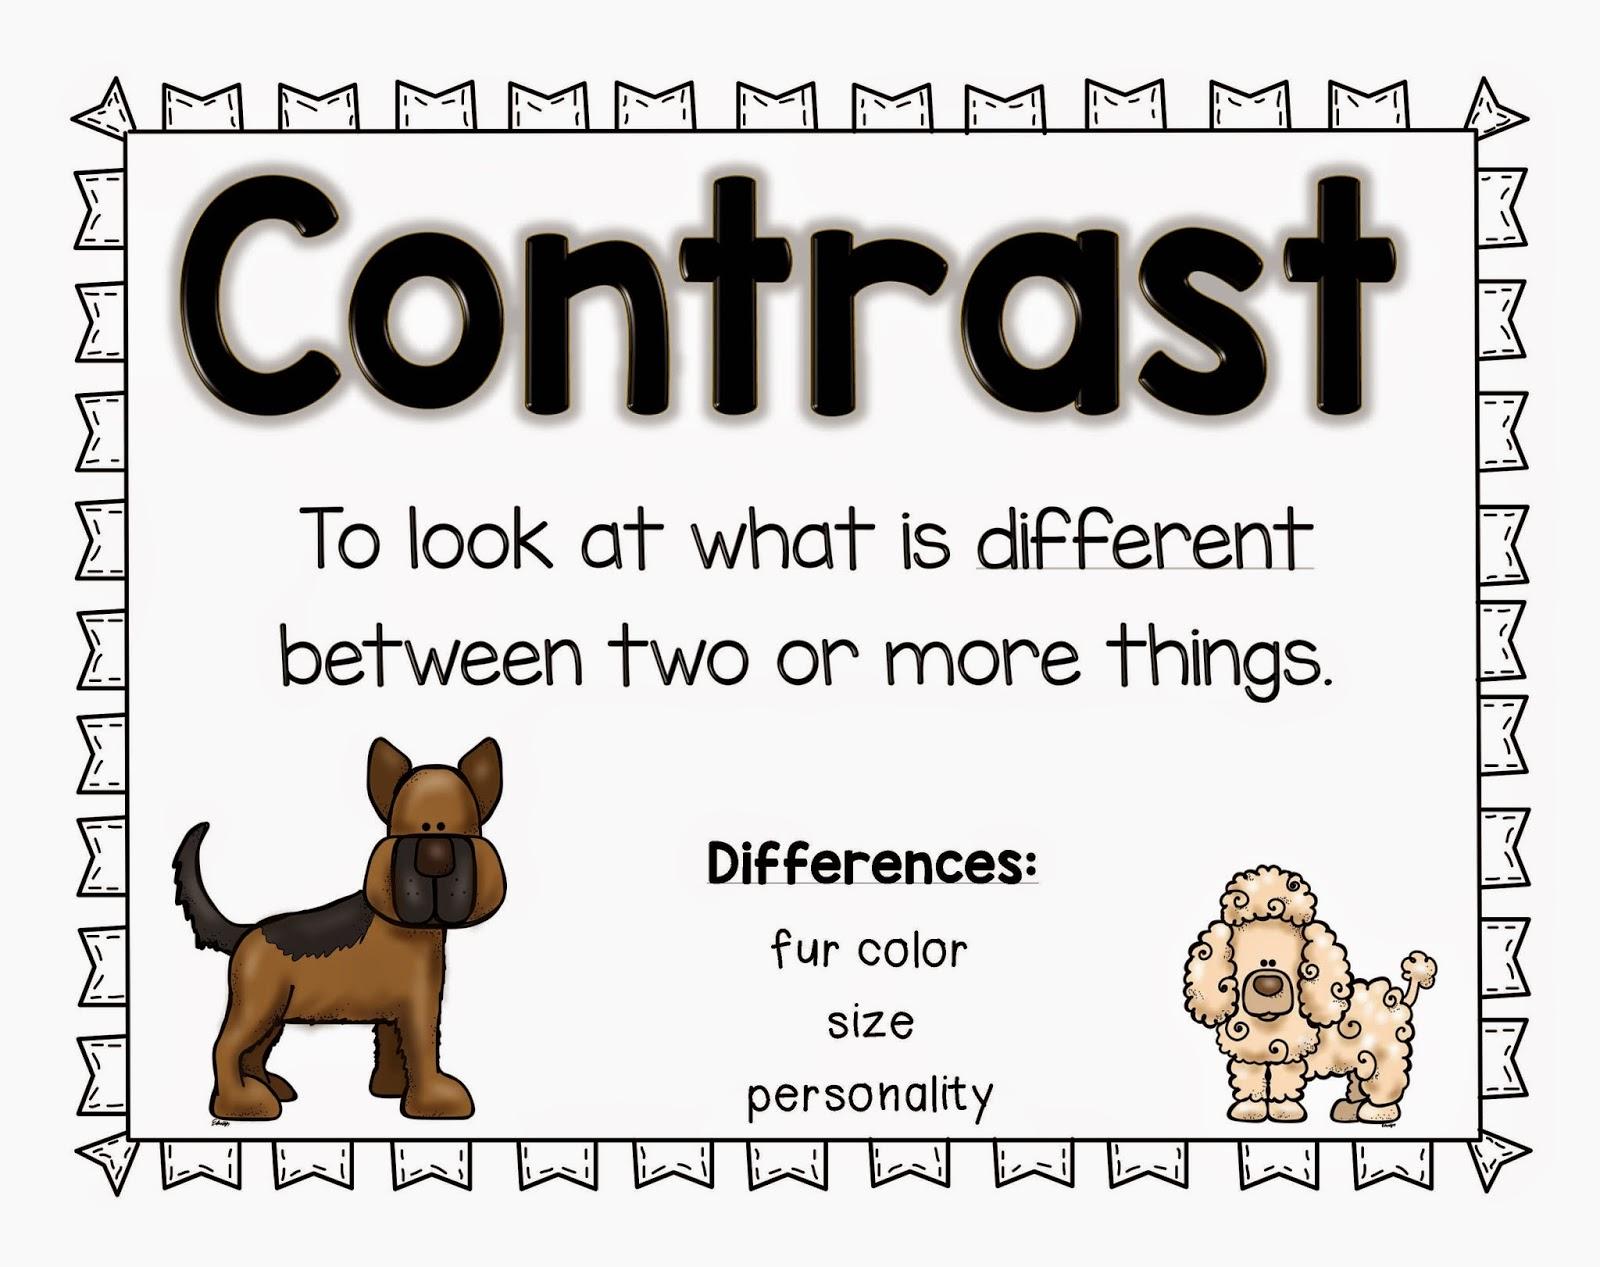 http://www.teacherspayteachers.com/Product/Compare-and-Contrast-1564745